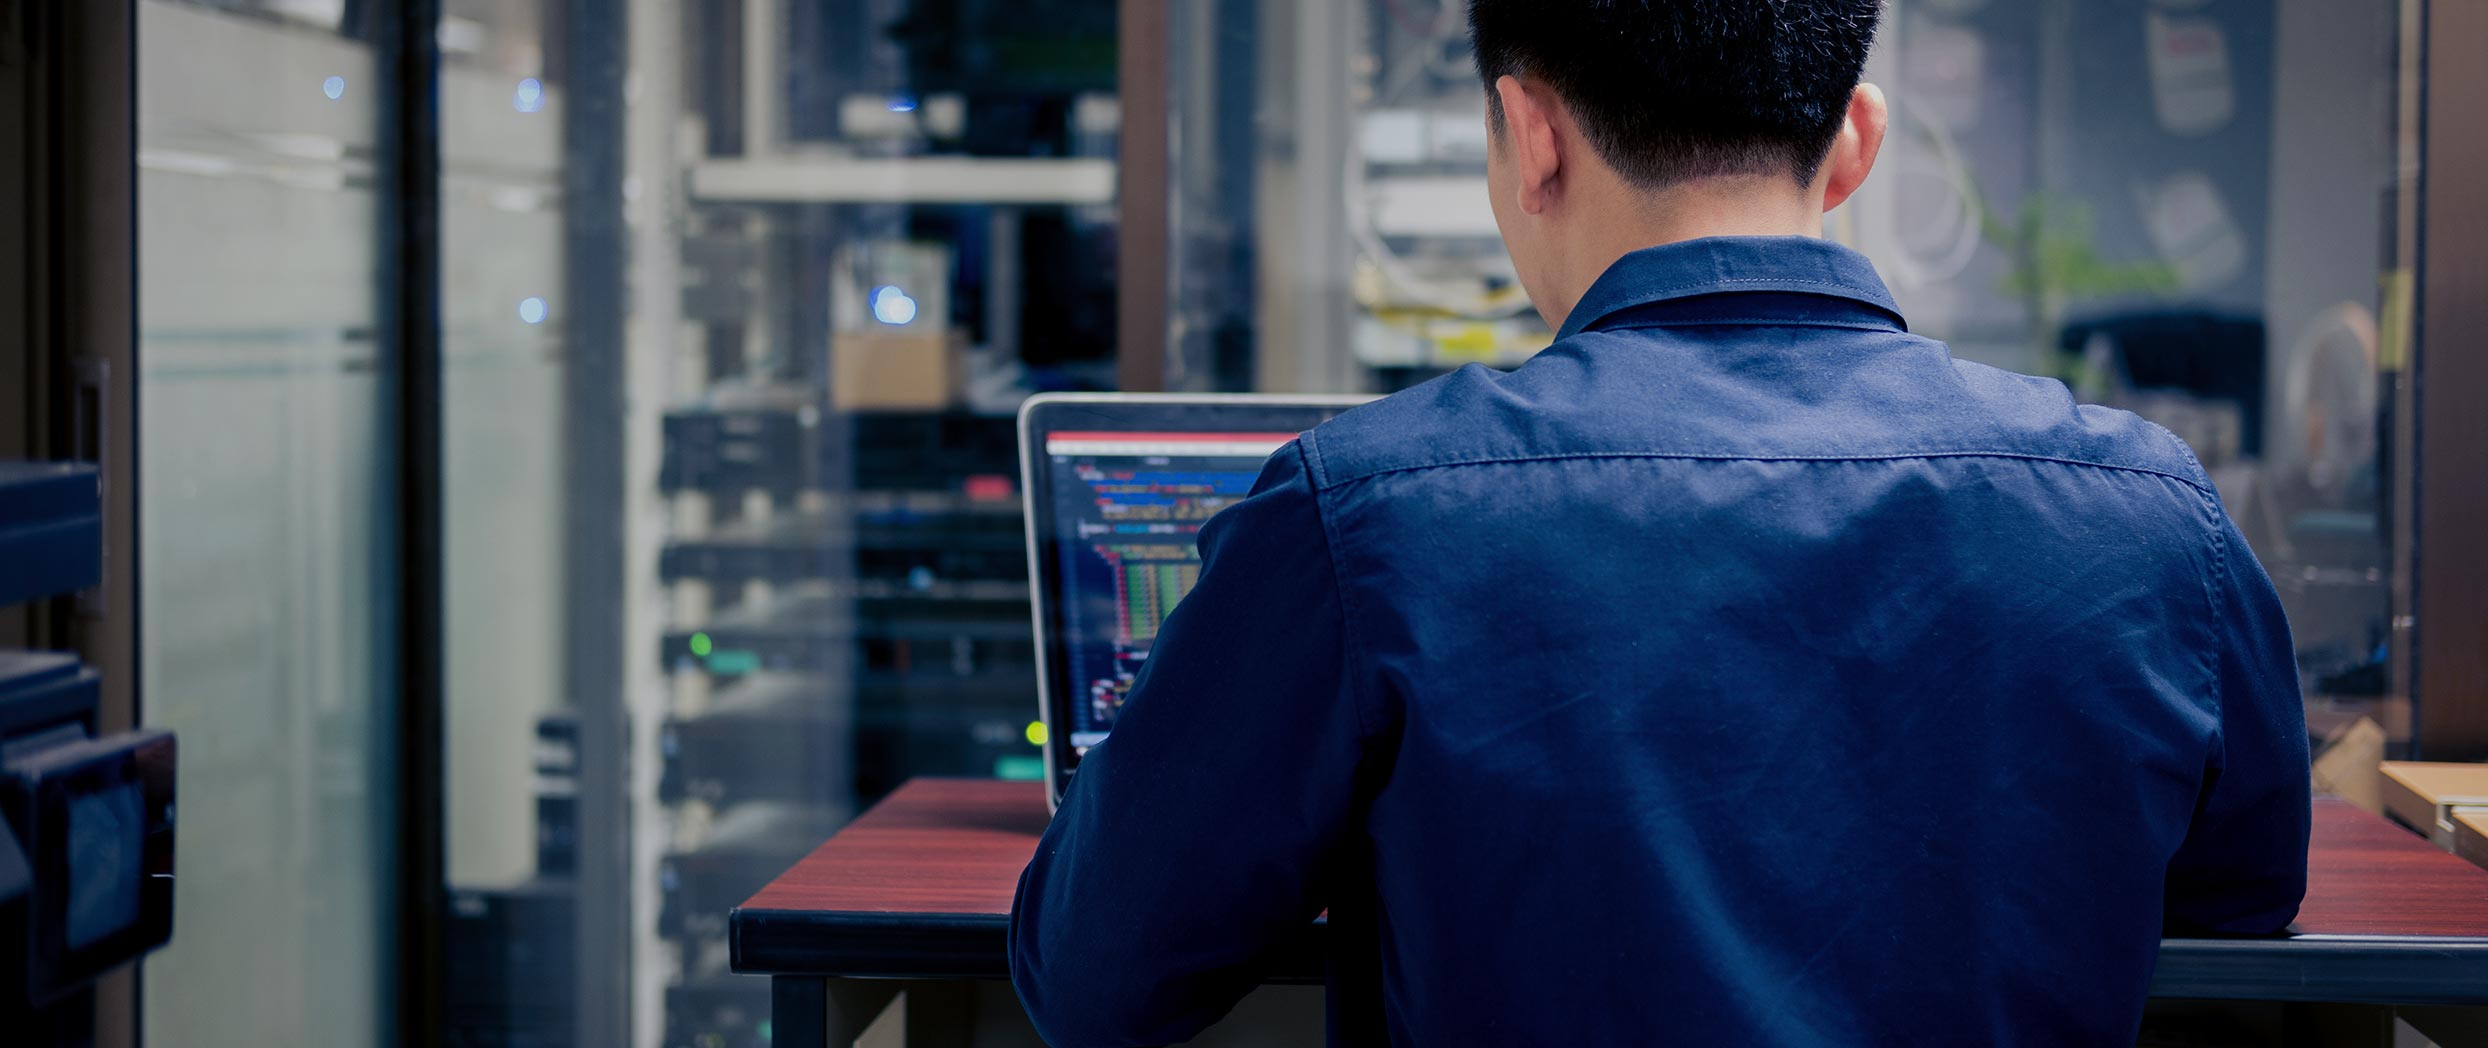 Companies' industrial properties in the spotlight for cybercriminals